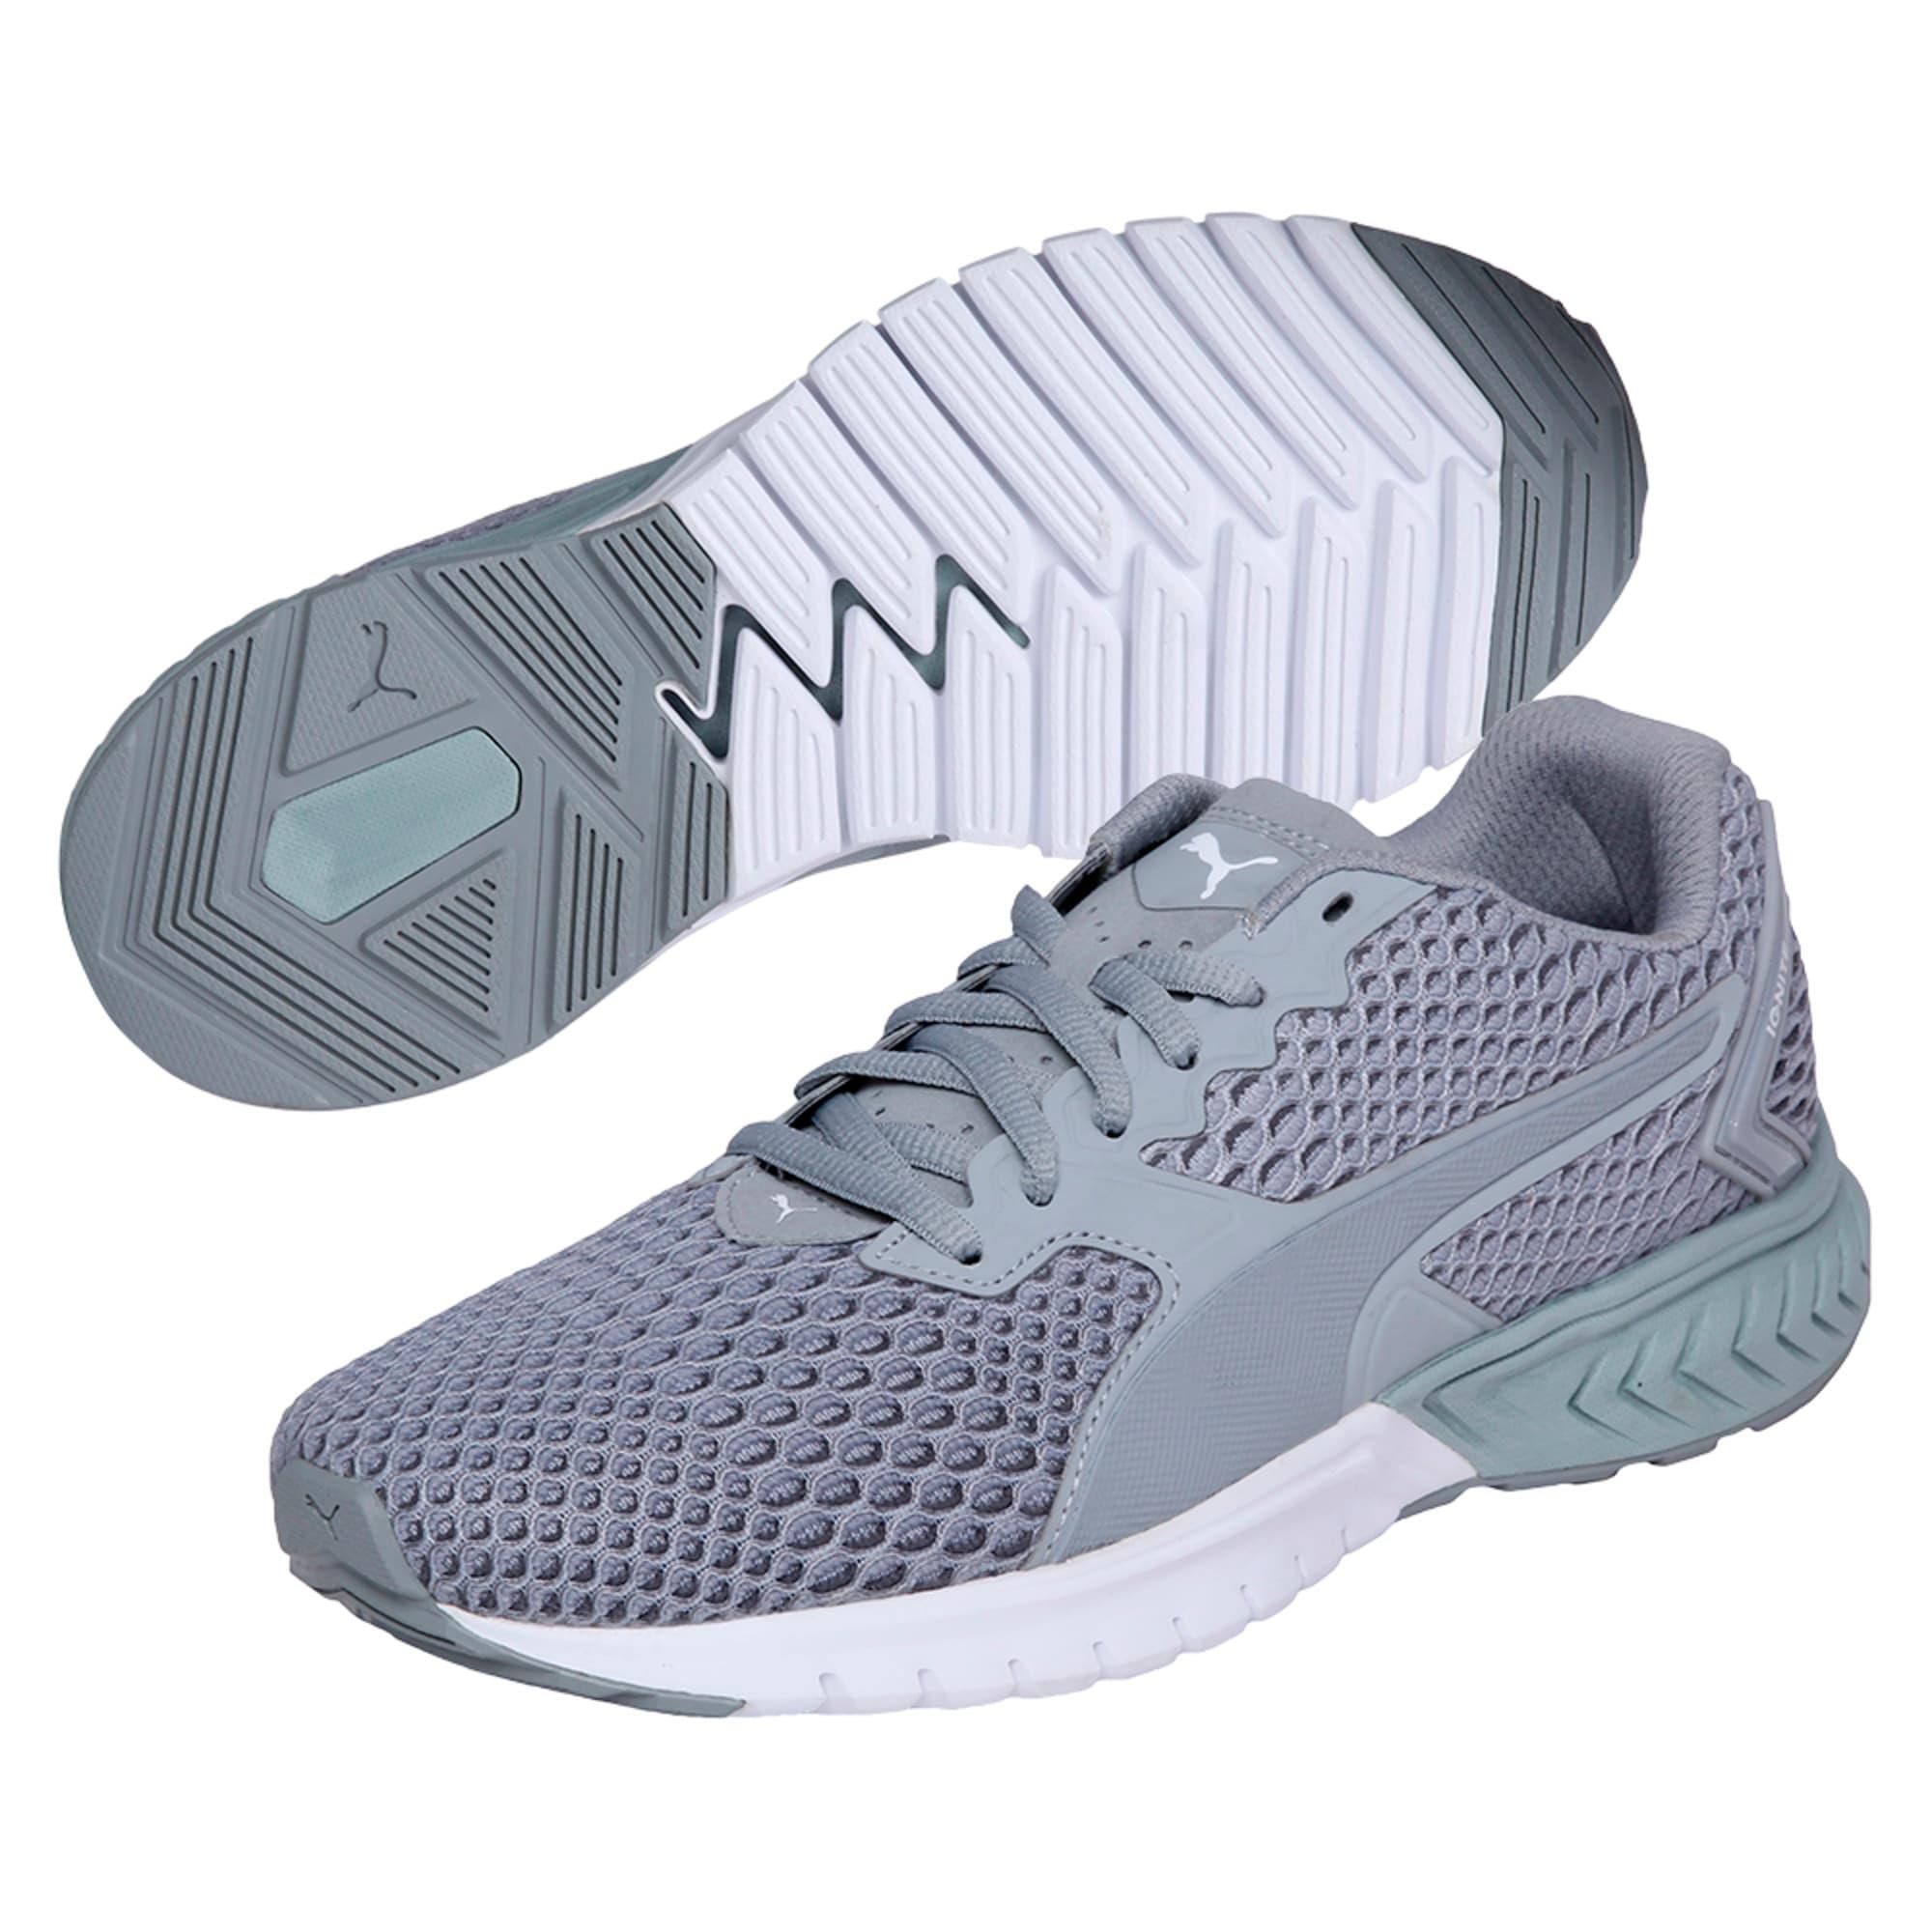 Thumbnail 2 of IGNITE Dual New Core Women's Training Shoes, Quarry-QUIET SHADE, medium-IND